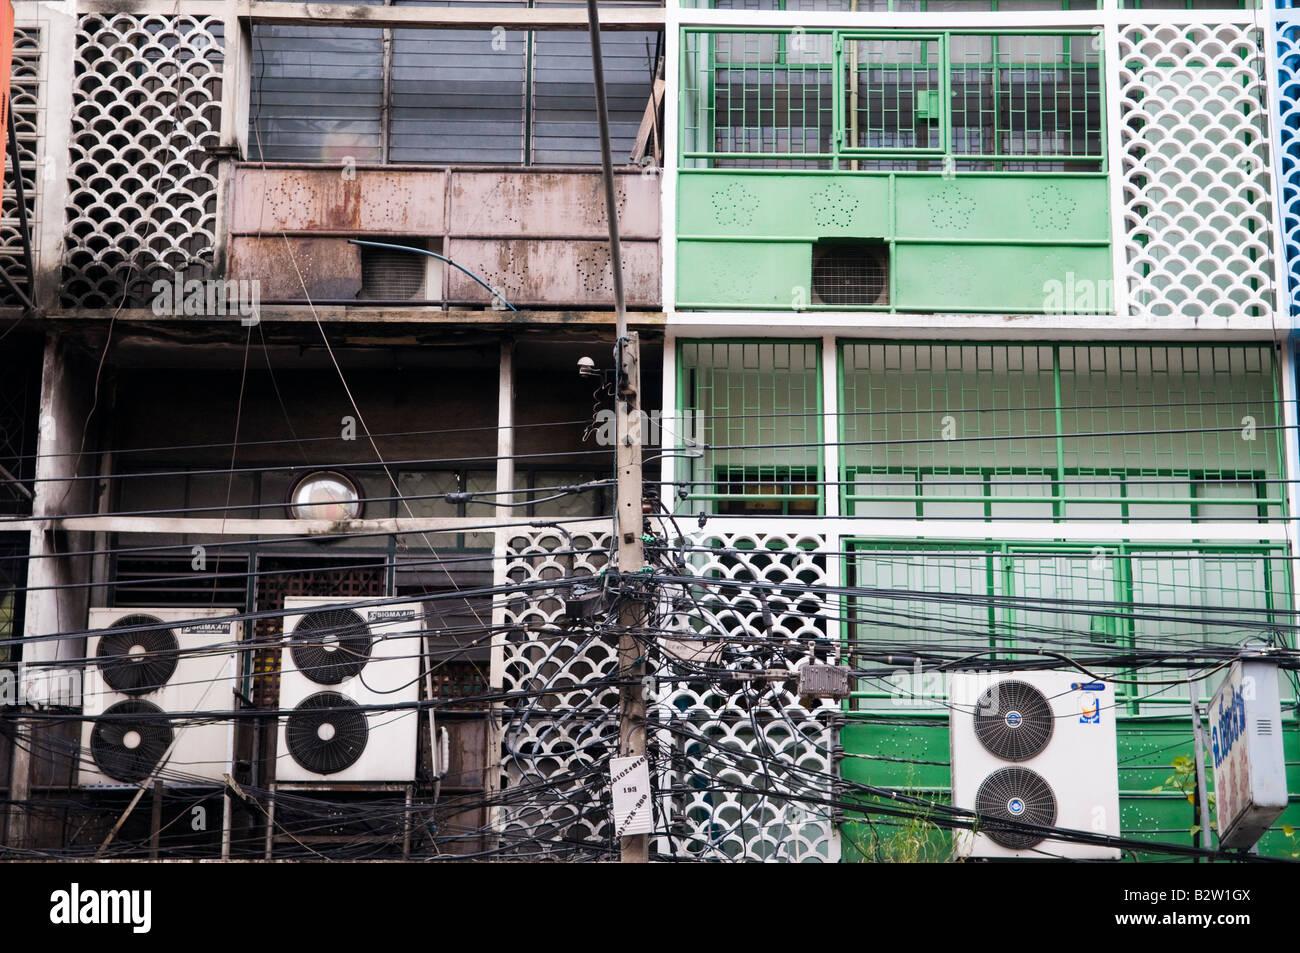 Urban images from Bangkok Stock Photo